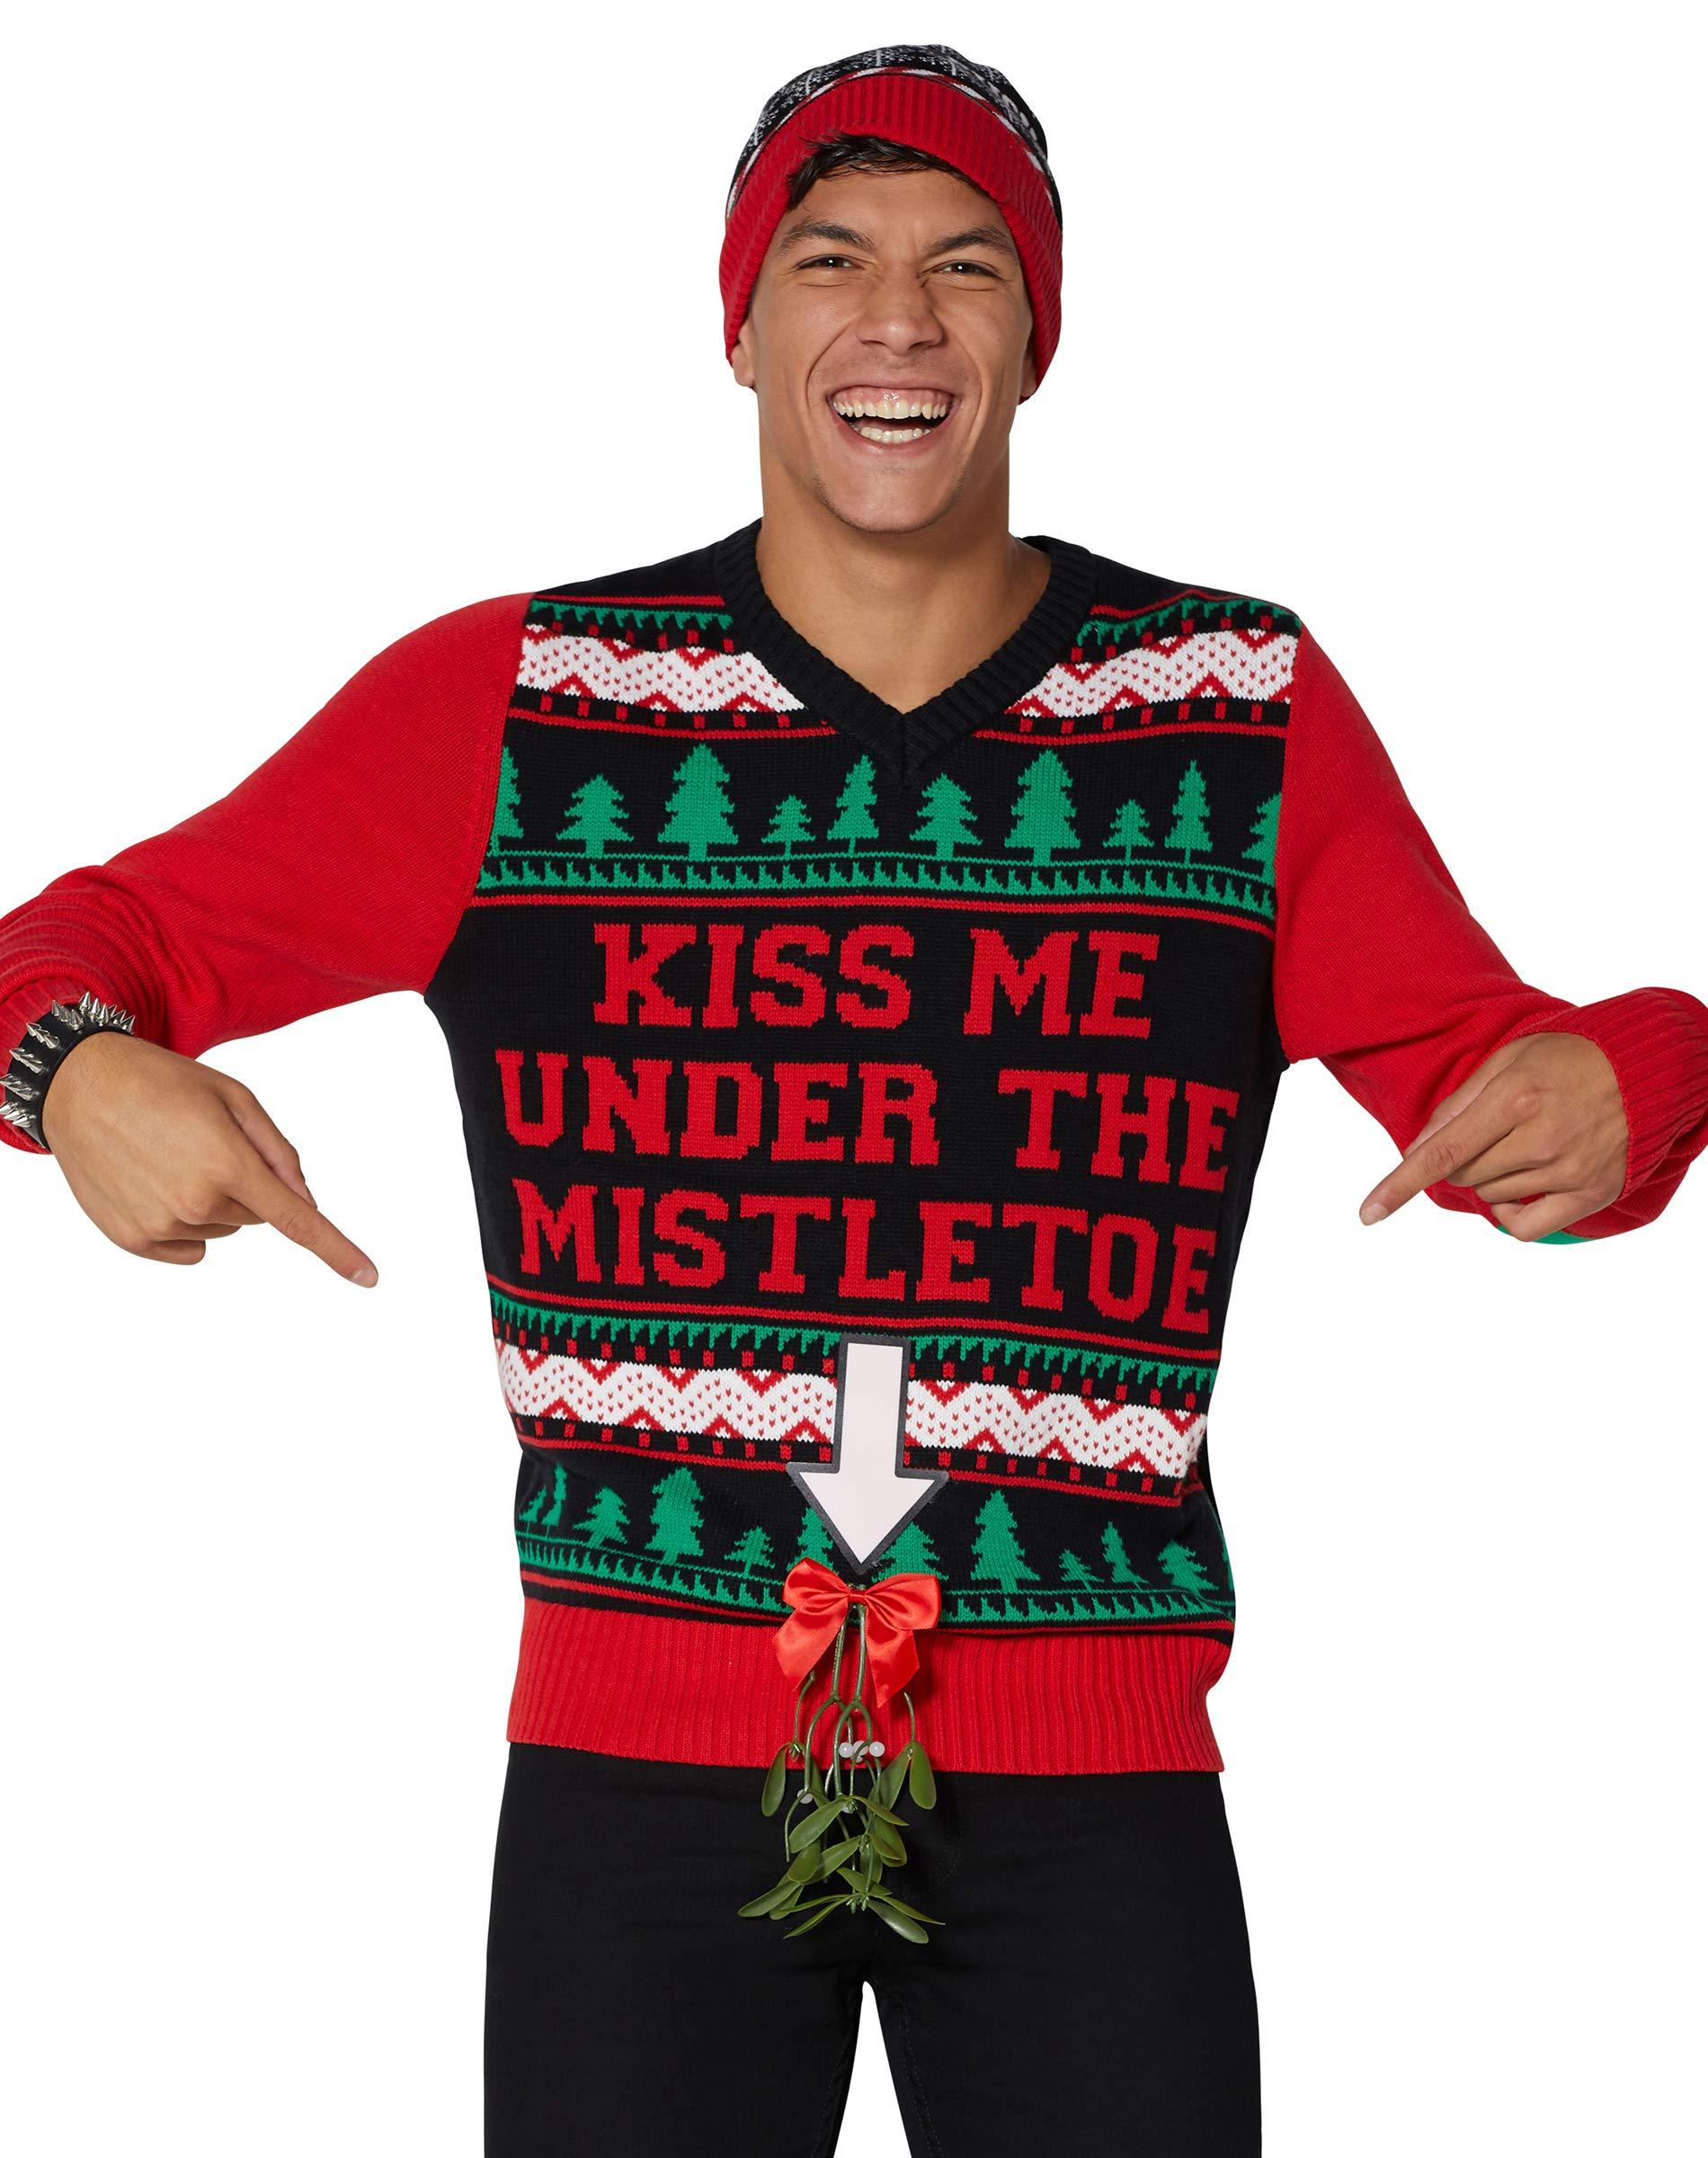 Kiss Me Mistletoe Light Up Ugly Christmas Sweater - L